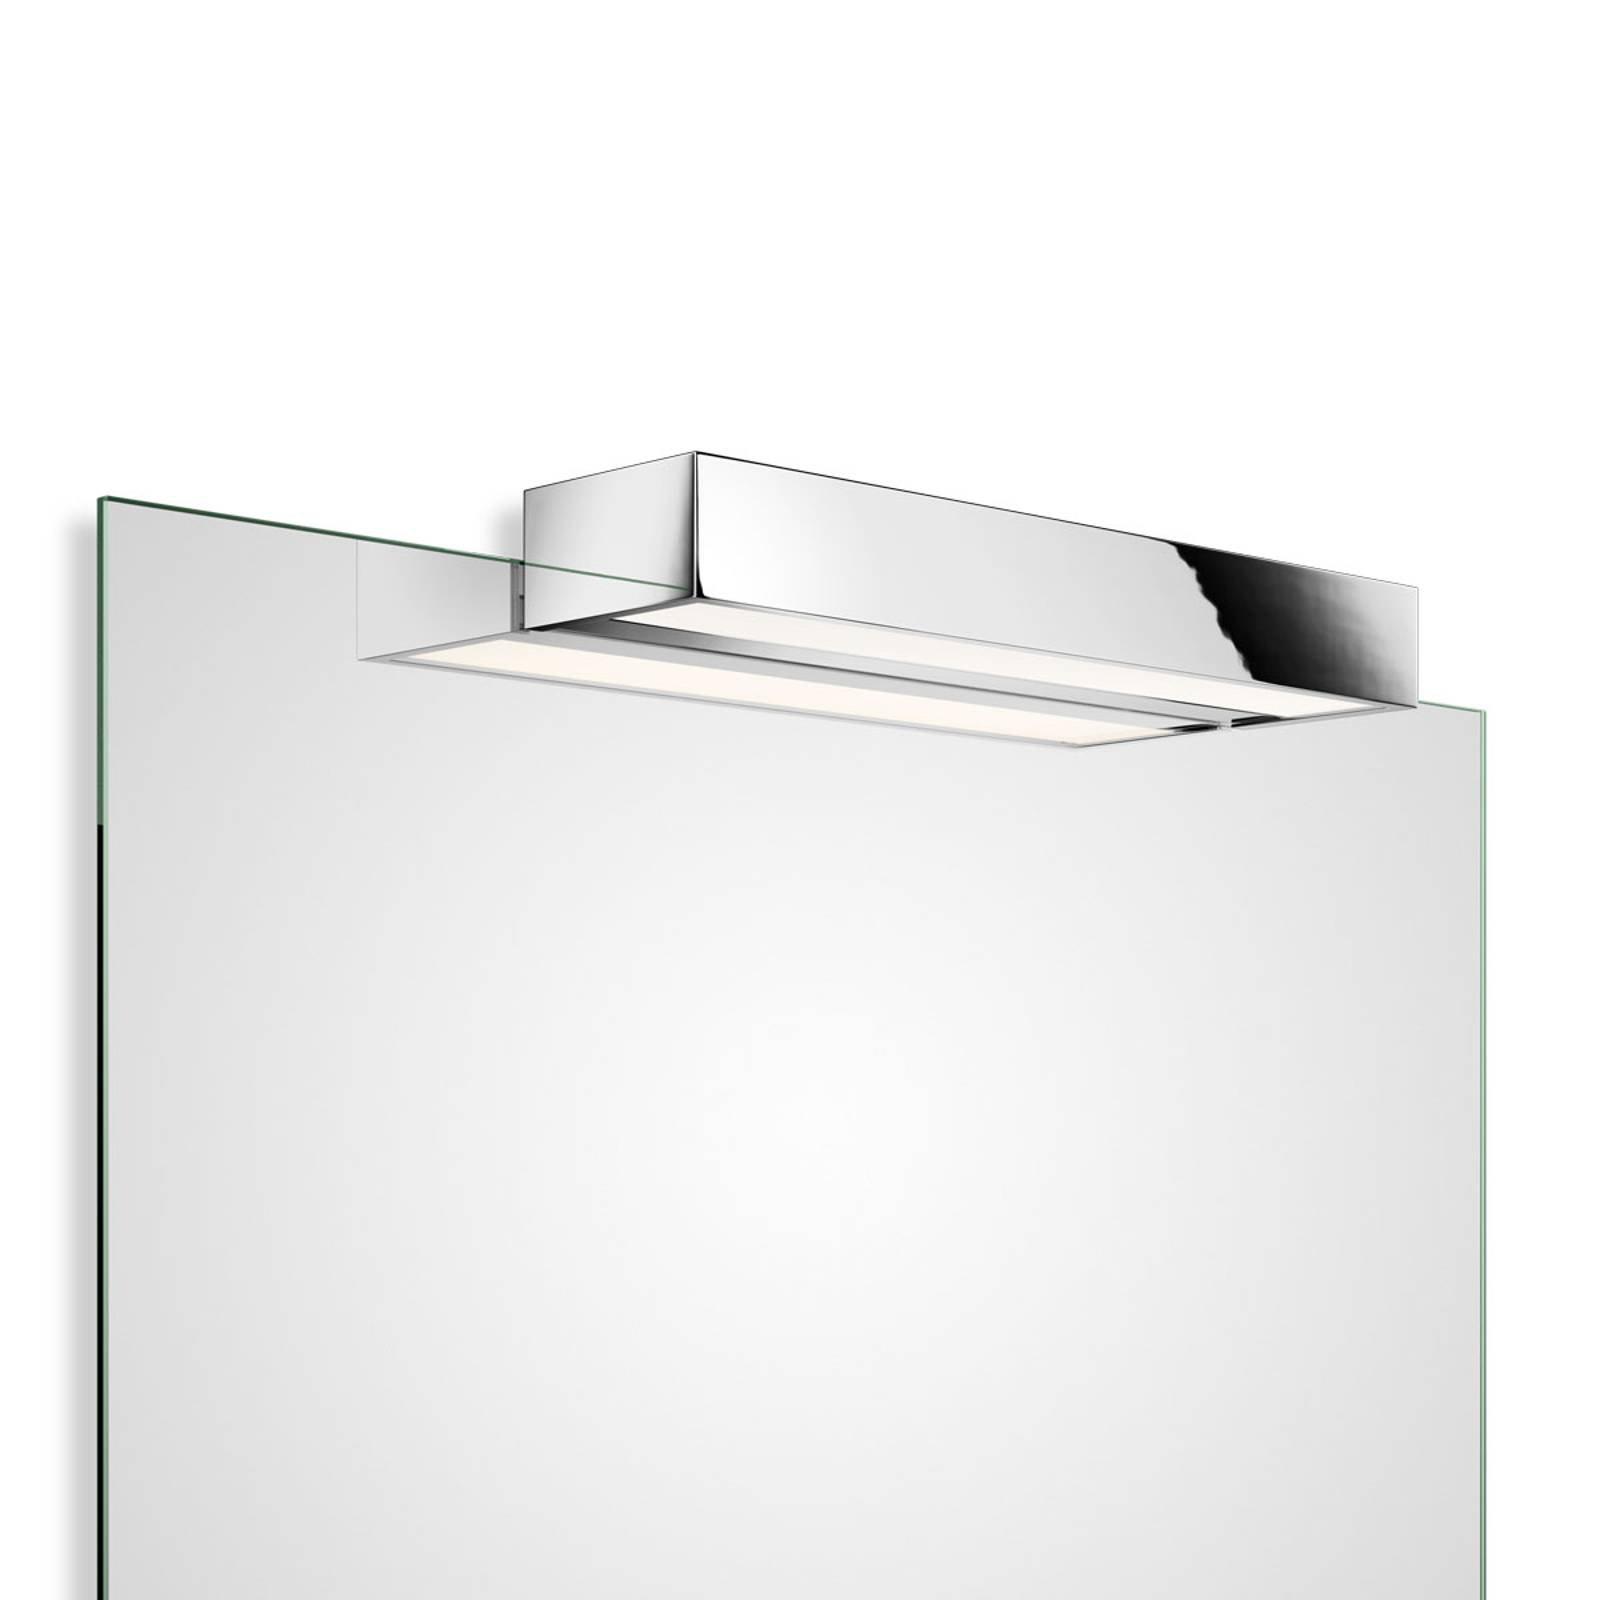 Decor Walther-boks 1-40 N LED-speillampe 2 700 K